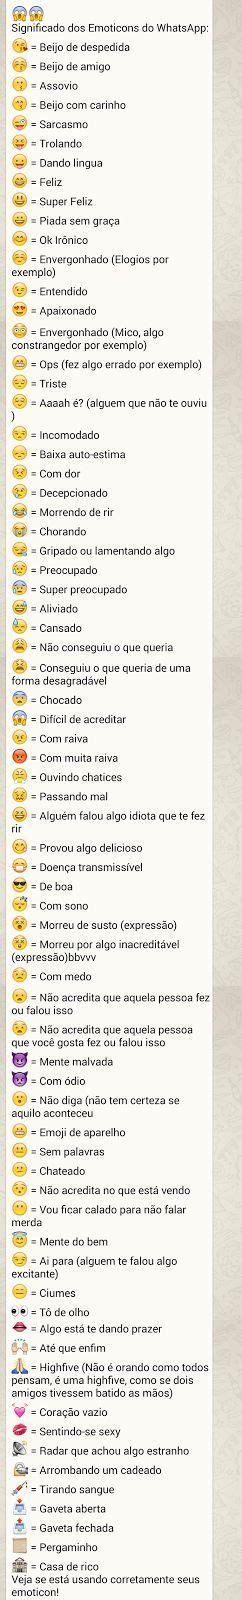 Significados Emoticons Whatsapp!! | Jabuti Rei: | Coisas ...